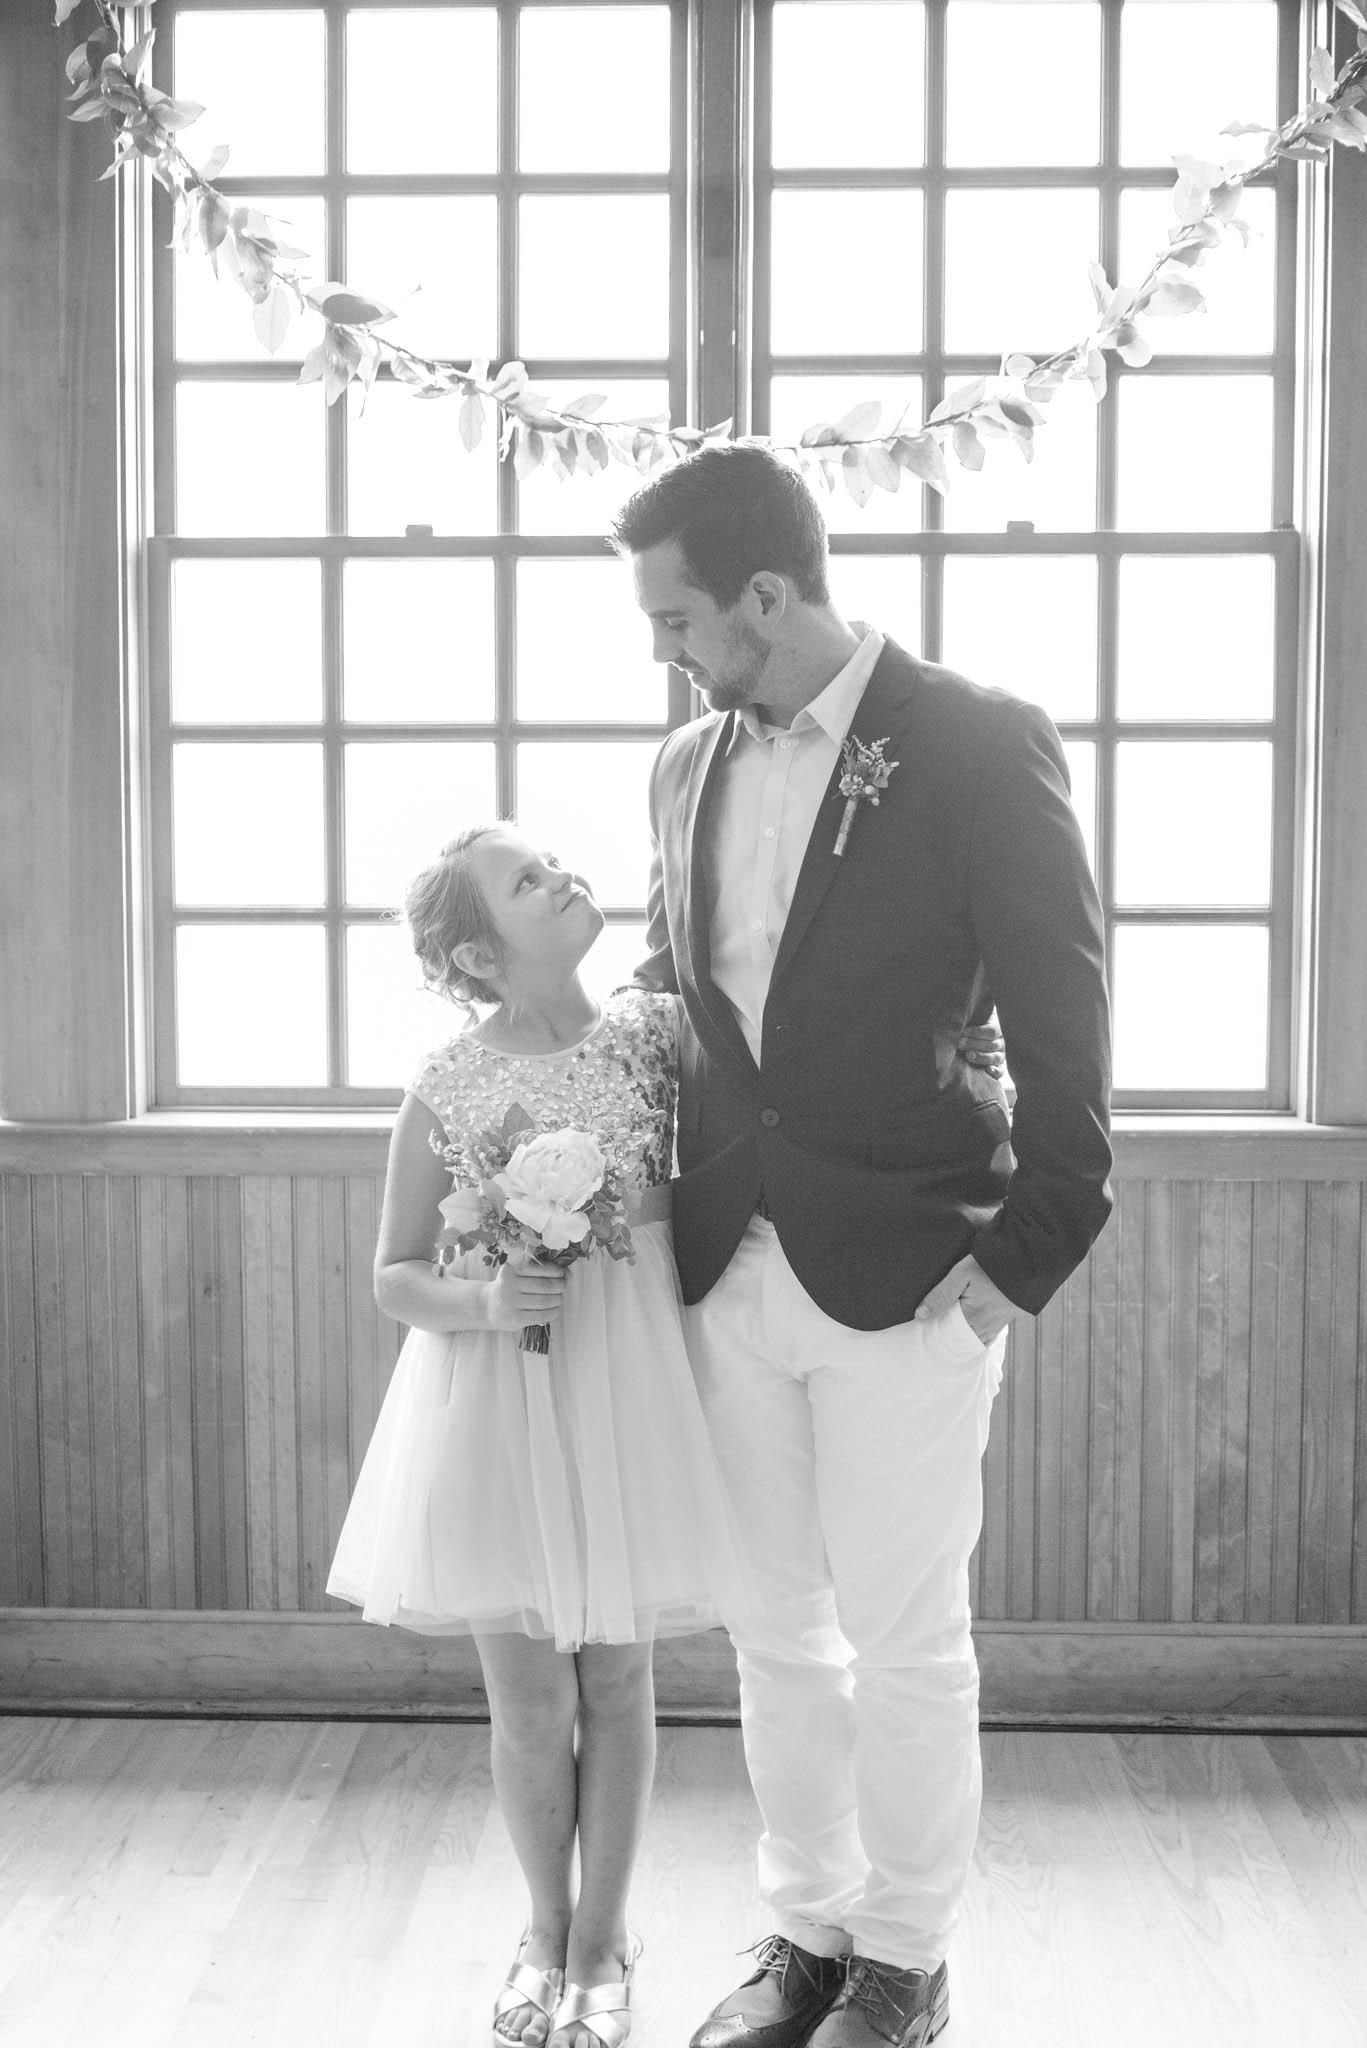 Stocking+Wedding+Blog+-+Blog+Brooke+Summers+Photography-8.jpg